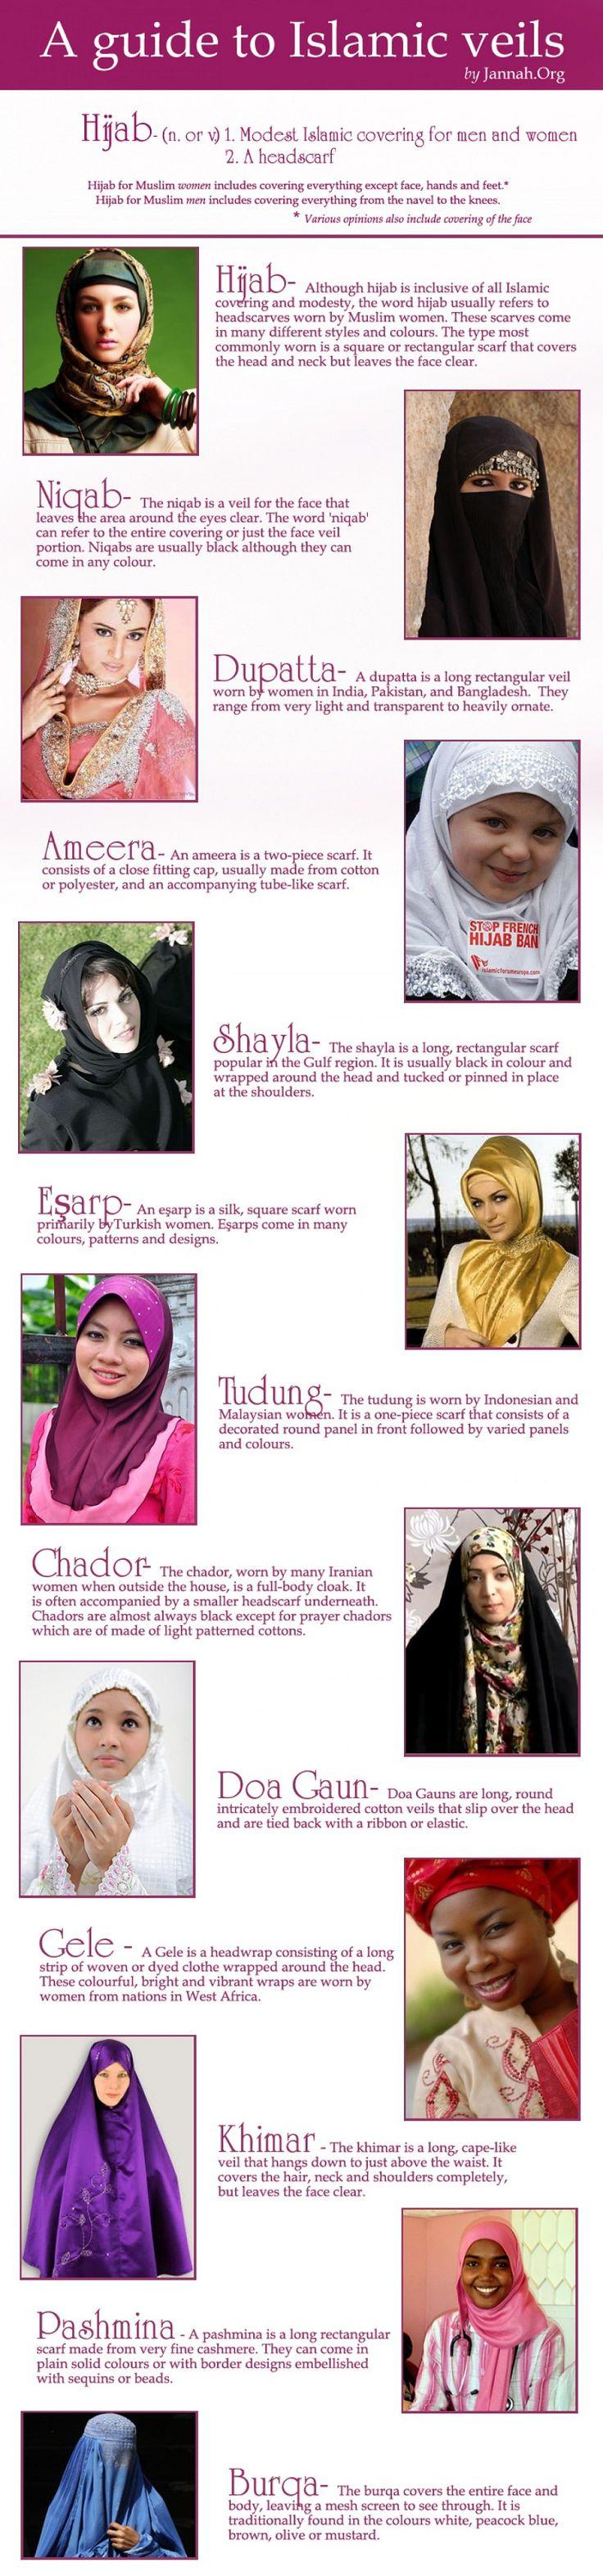 islamic veils guide